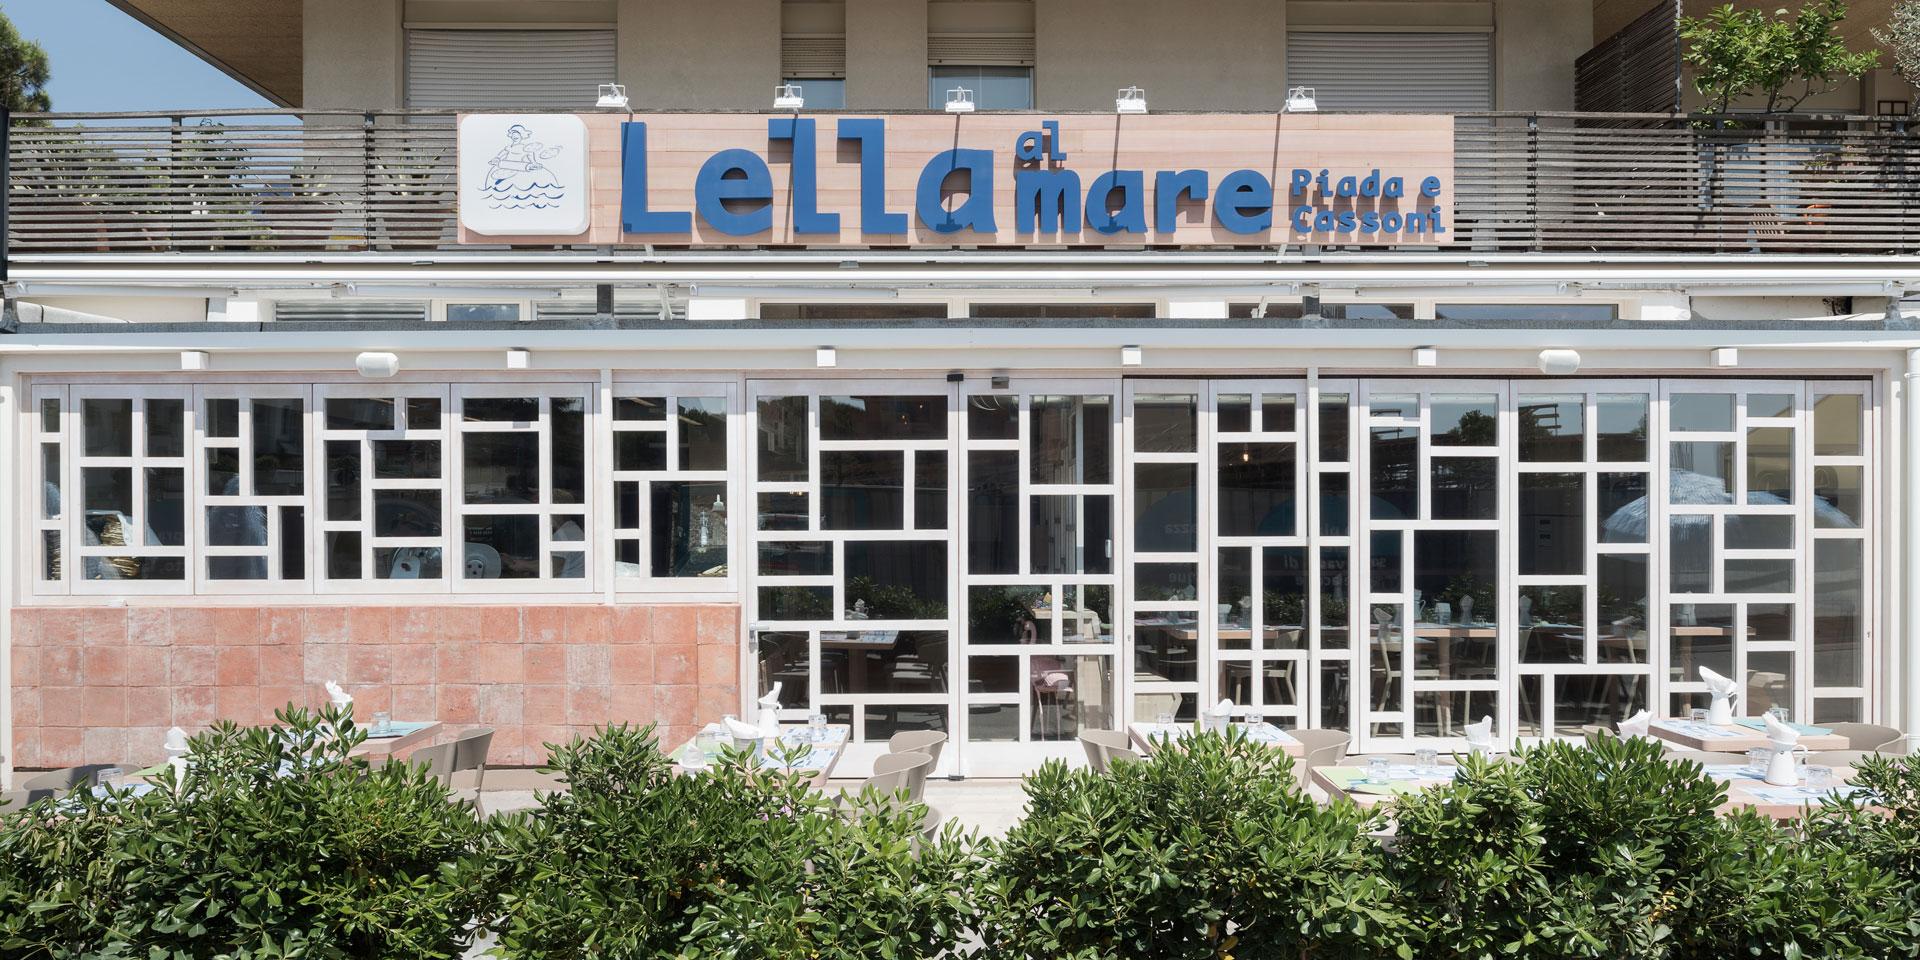 archinow_LEK_lella-al-mare-takestay_HOME